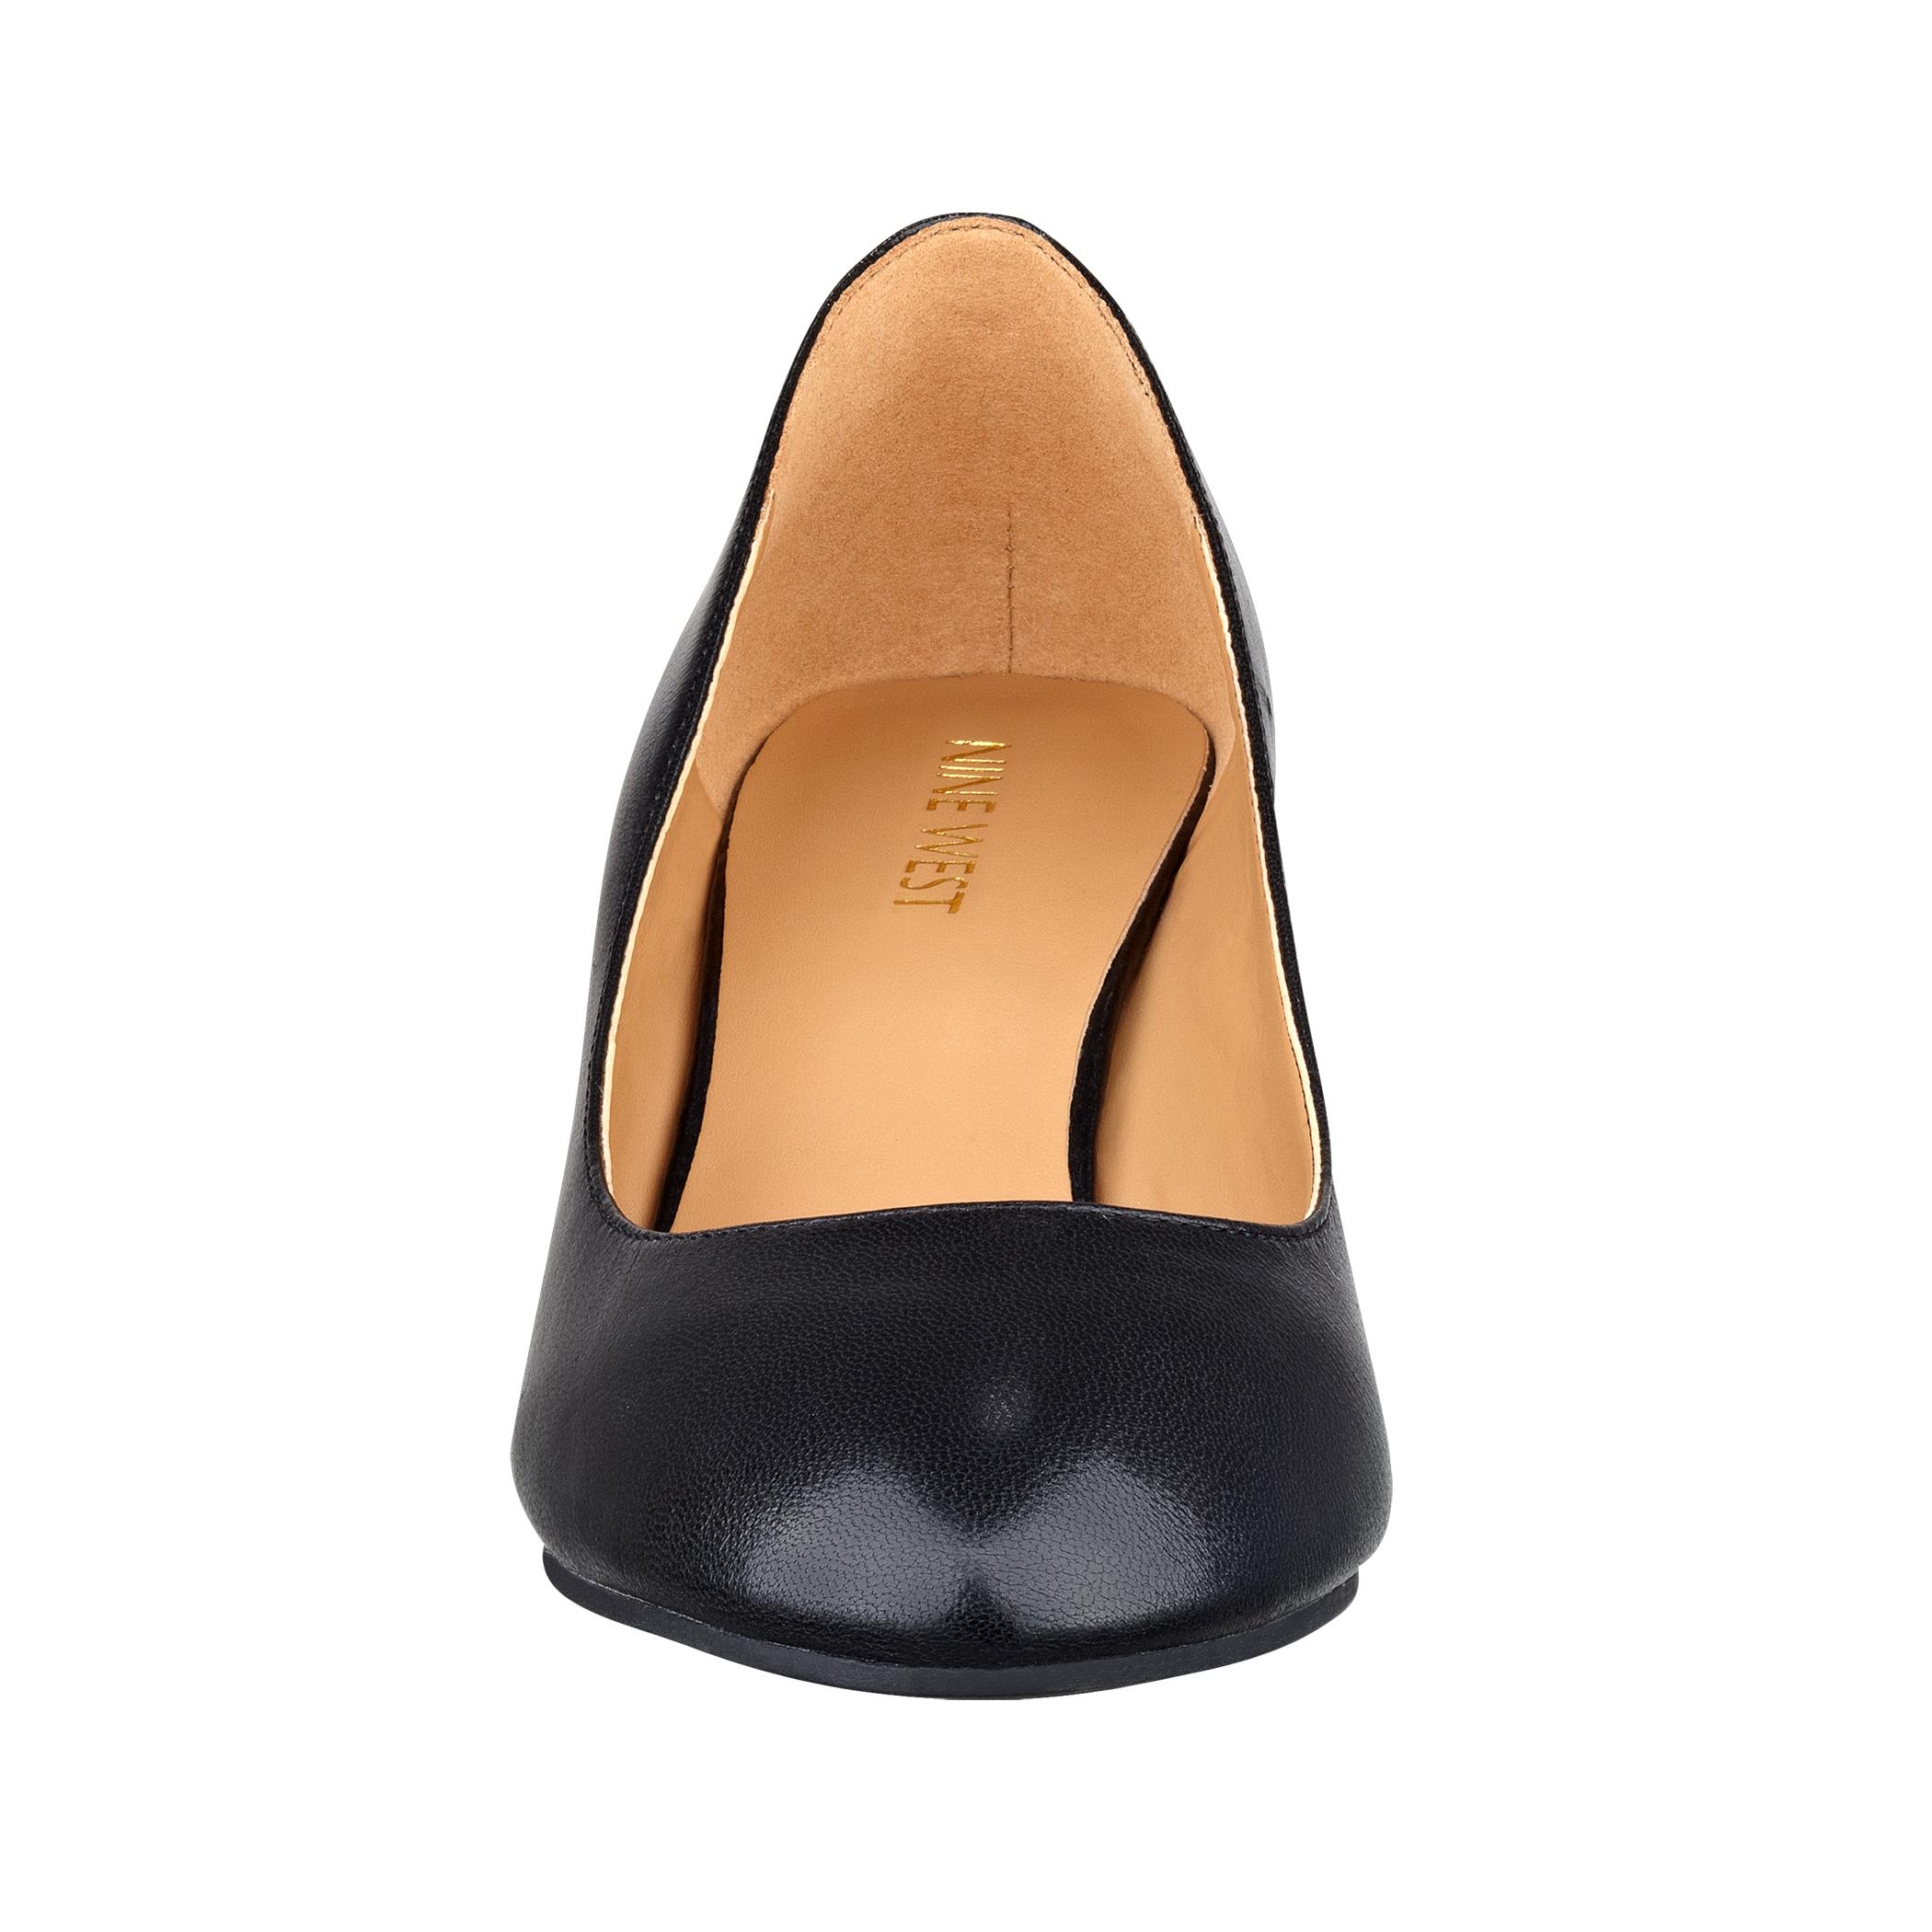 8a4817f1a9 Nine West Ispy Wedge Heels in Black - Lyst